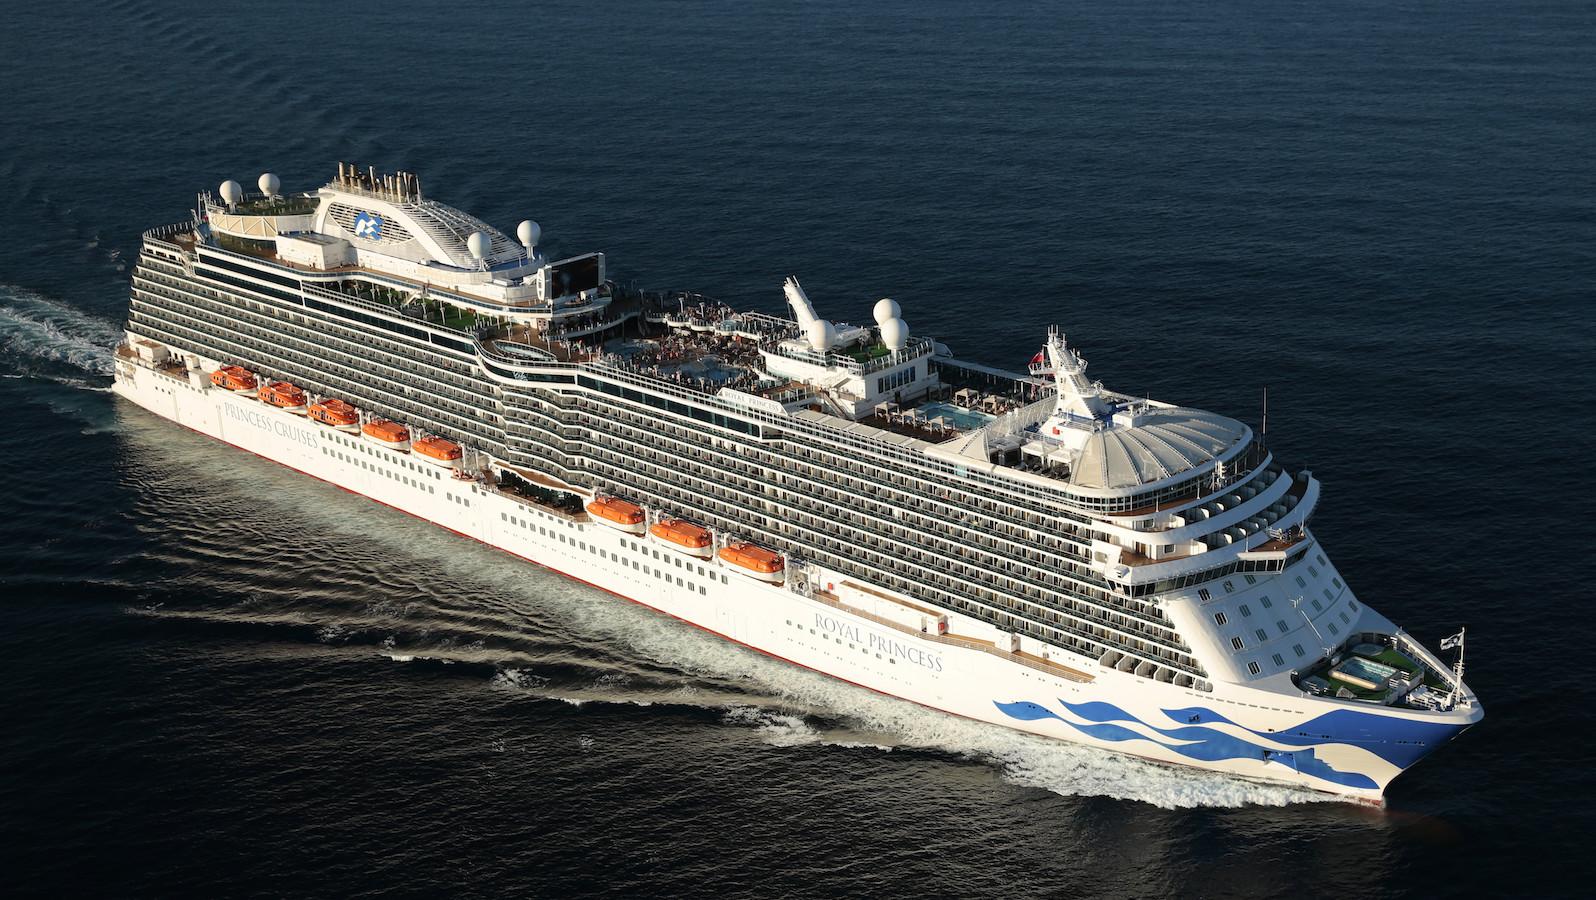 The Carnival Regal Princess at sea.